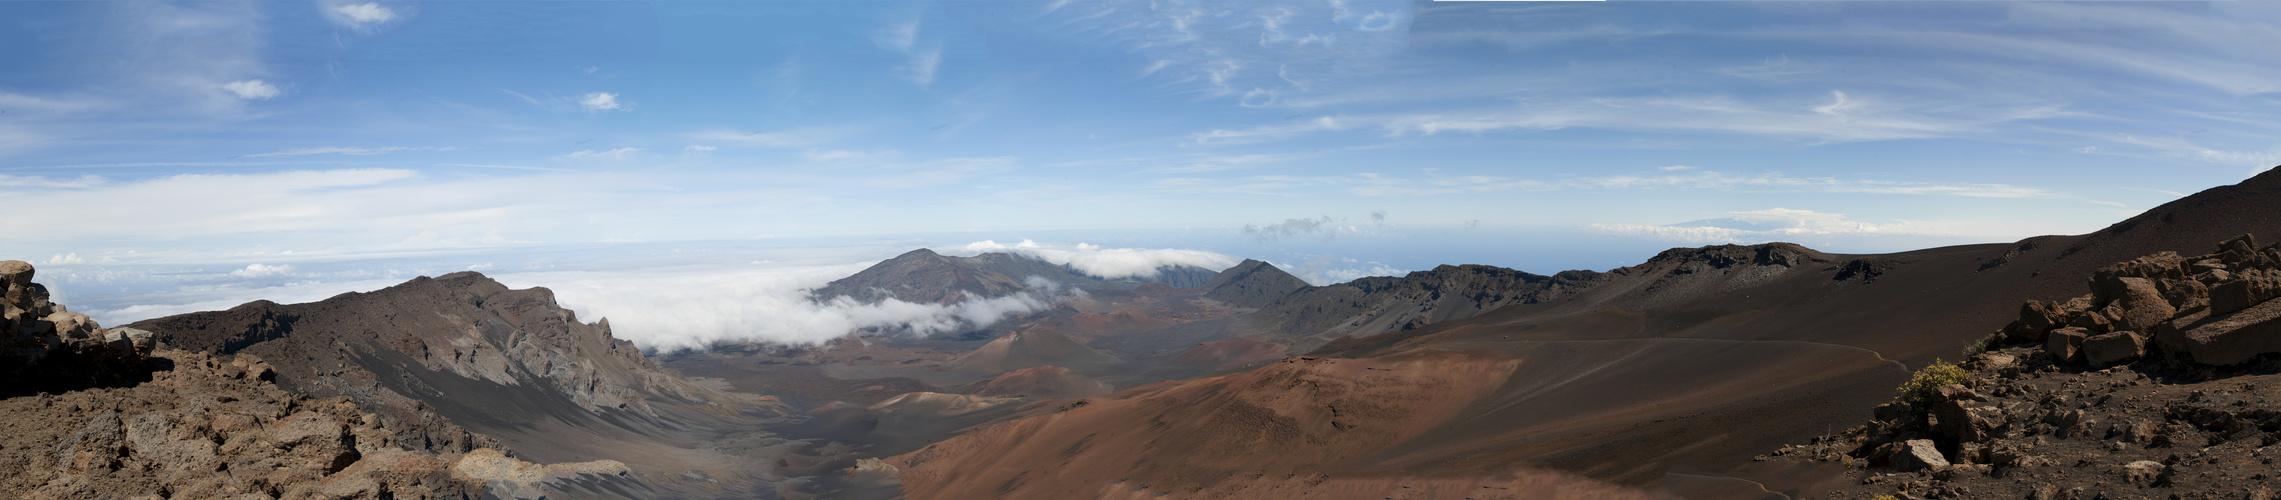 Panorama Haleakala